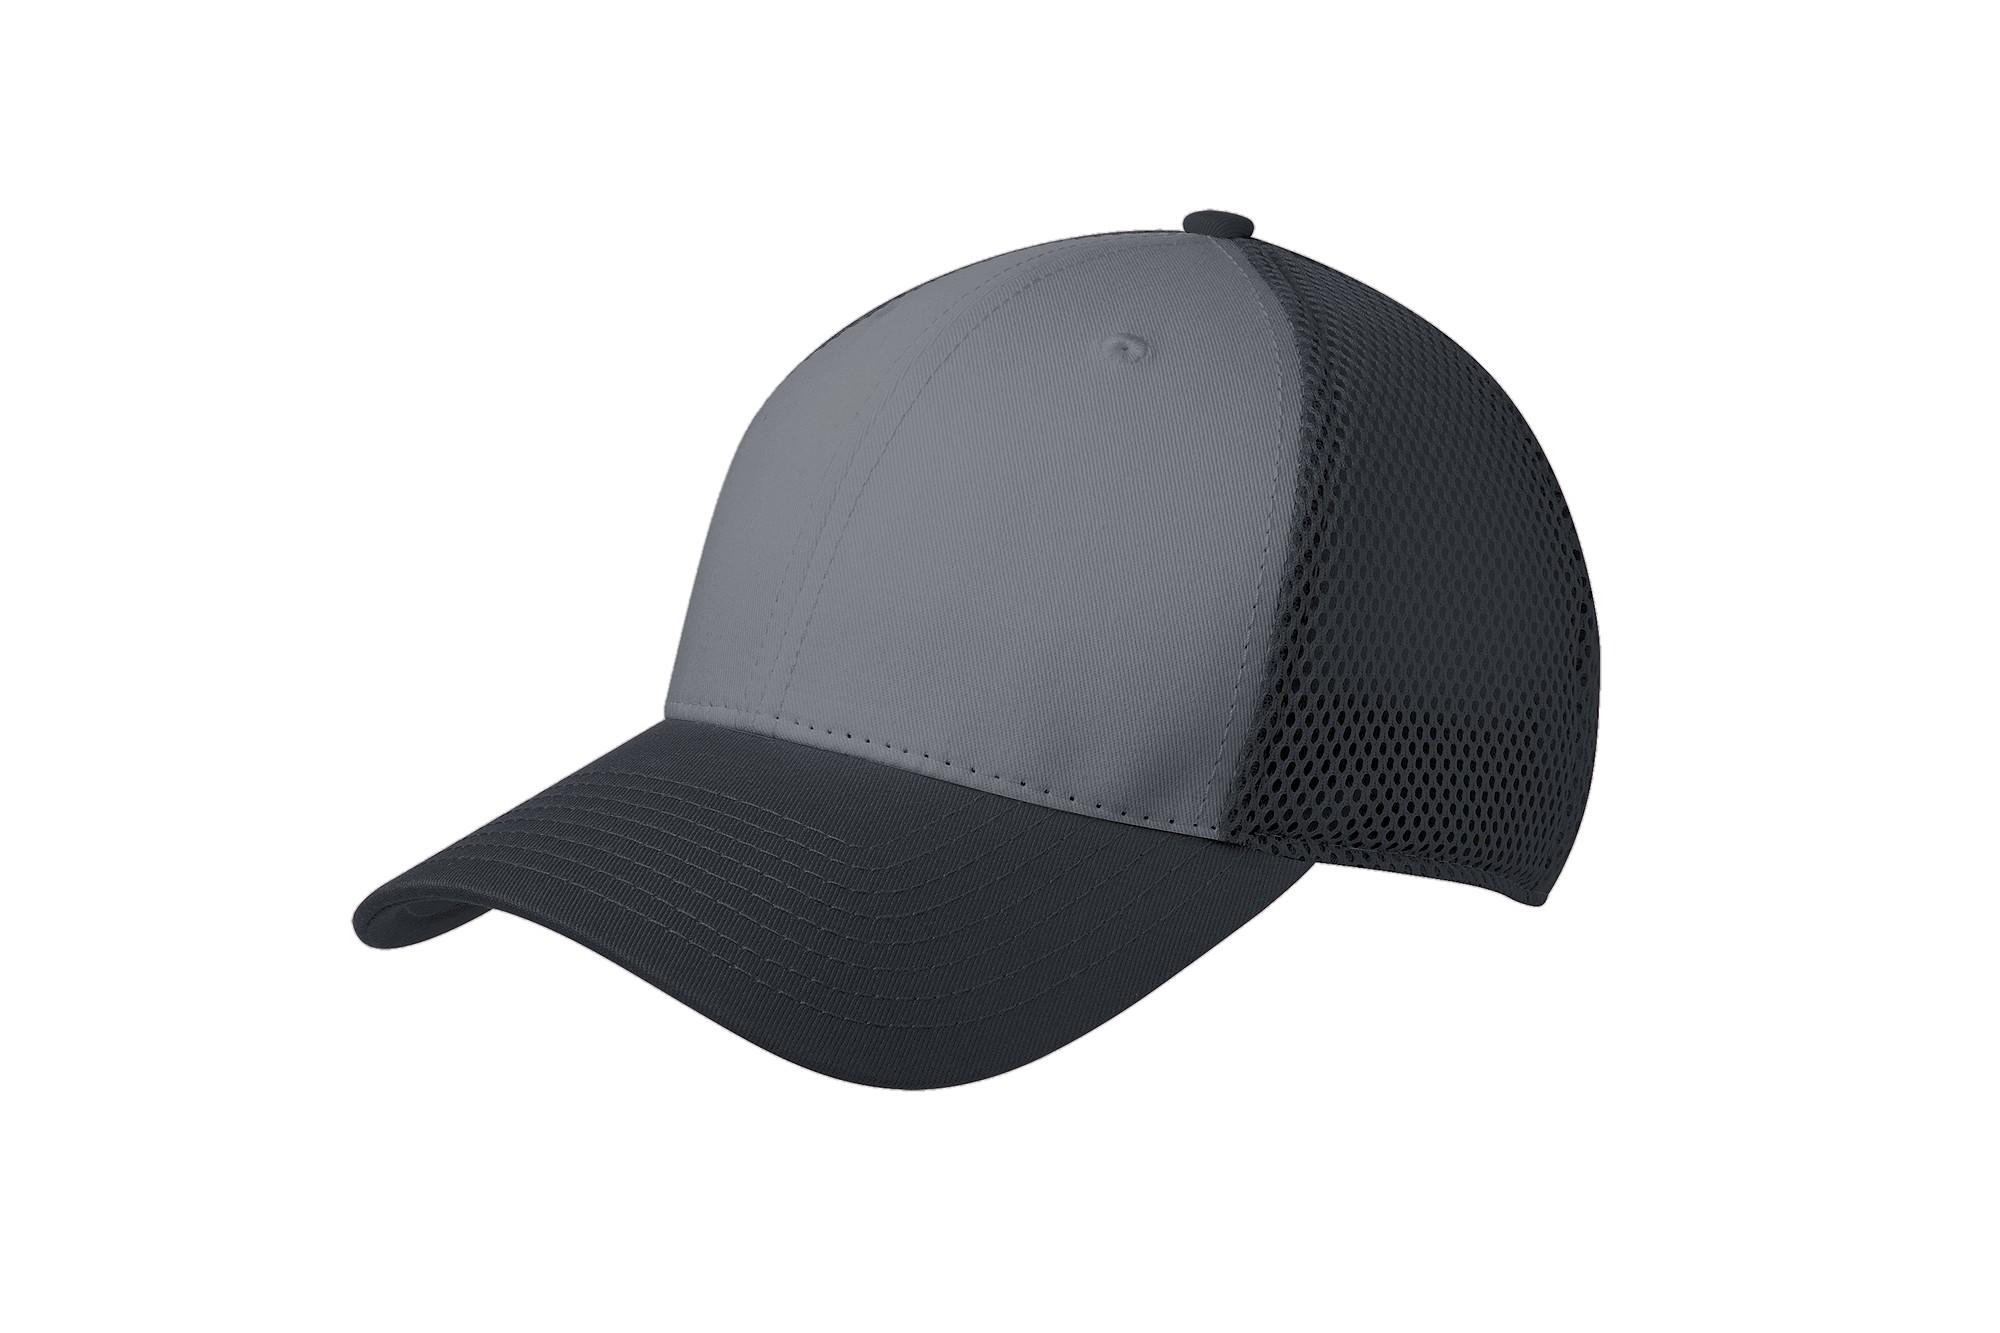 70c9abfd5 AMP_US | New Era® Snapback Contrast Front Mesh Cap